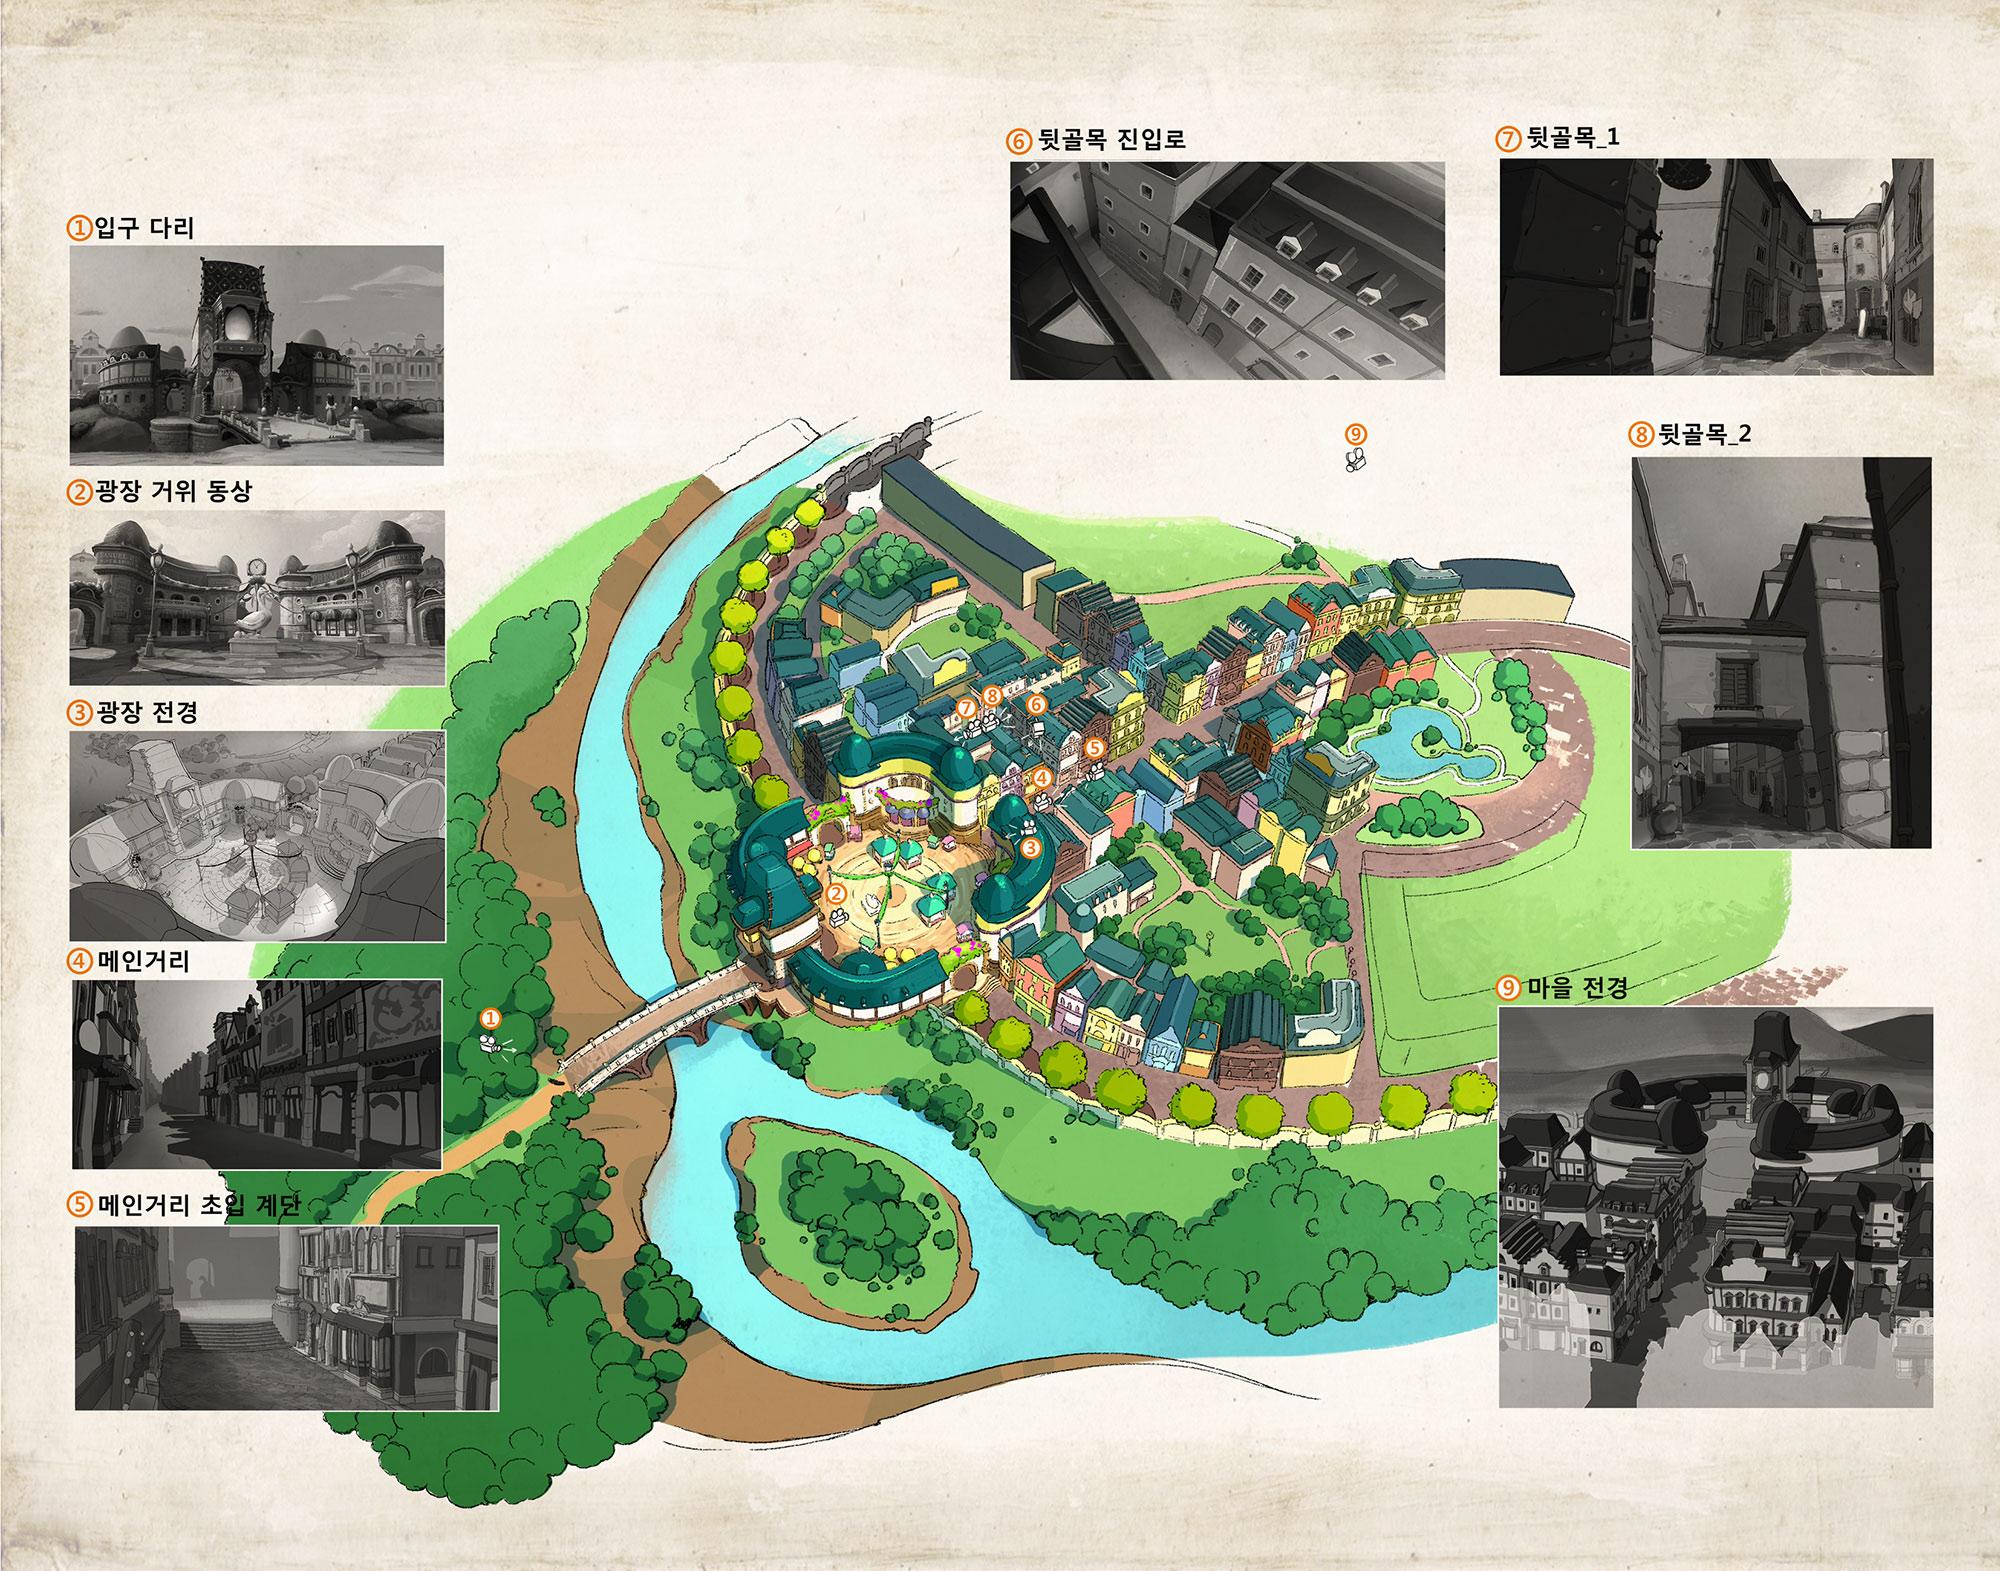 Design of the Golden Goose town by Yeonok Baek.